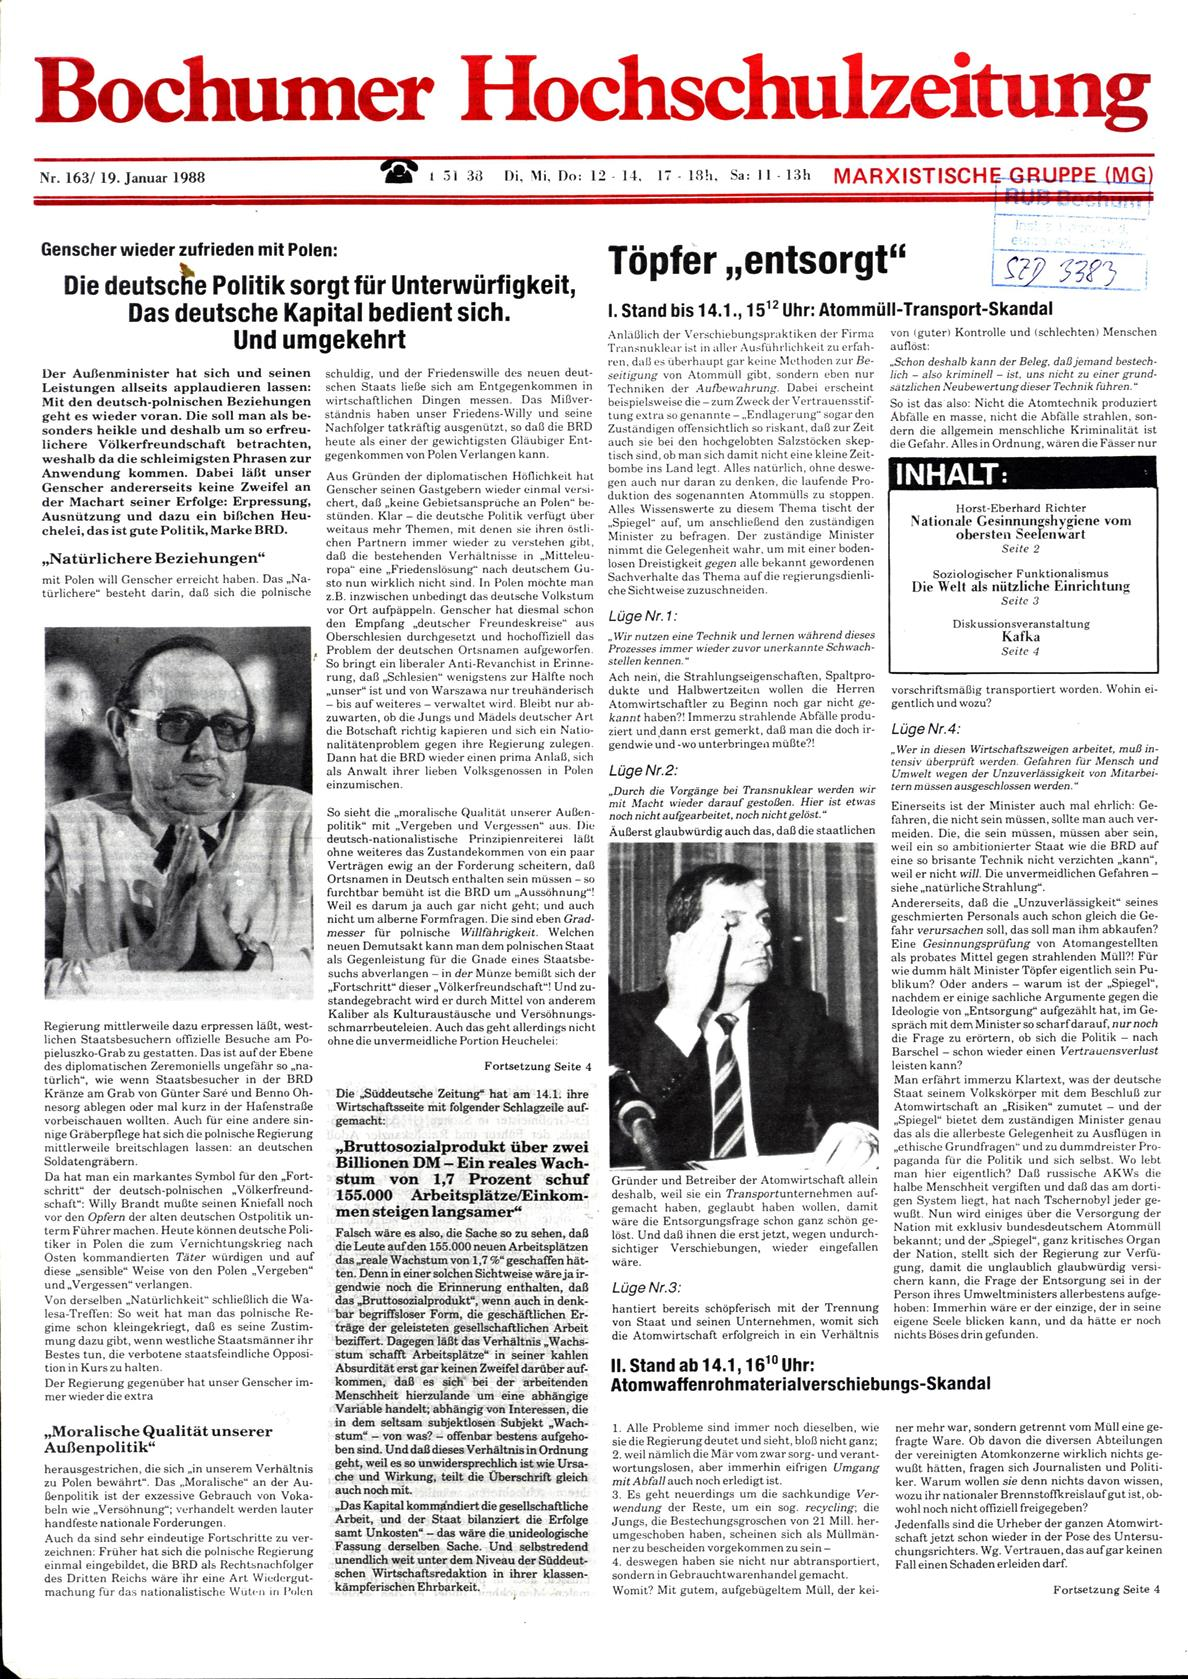 Bochum_BHZ_19880119_163_001